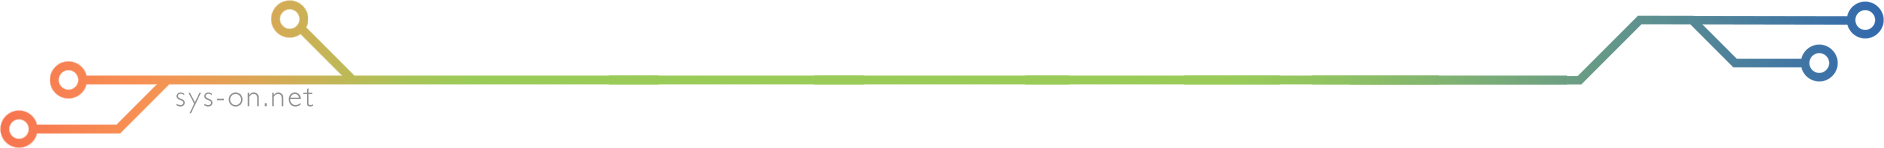 SeparatorNet - تسريب الخلفيات القادمة لهاتف Pixel 3 بجودة فائقة الدقة ومتاحة للتحميل